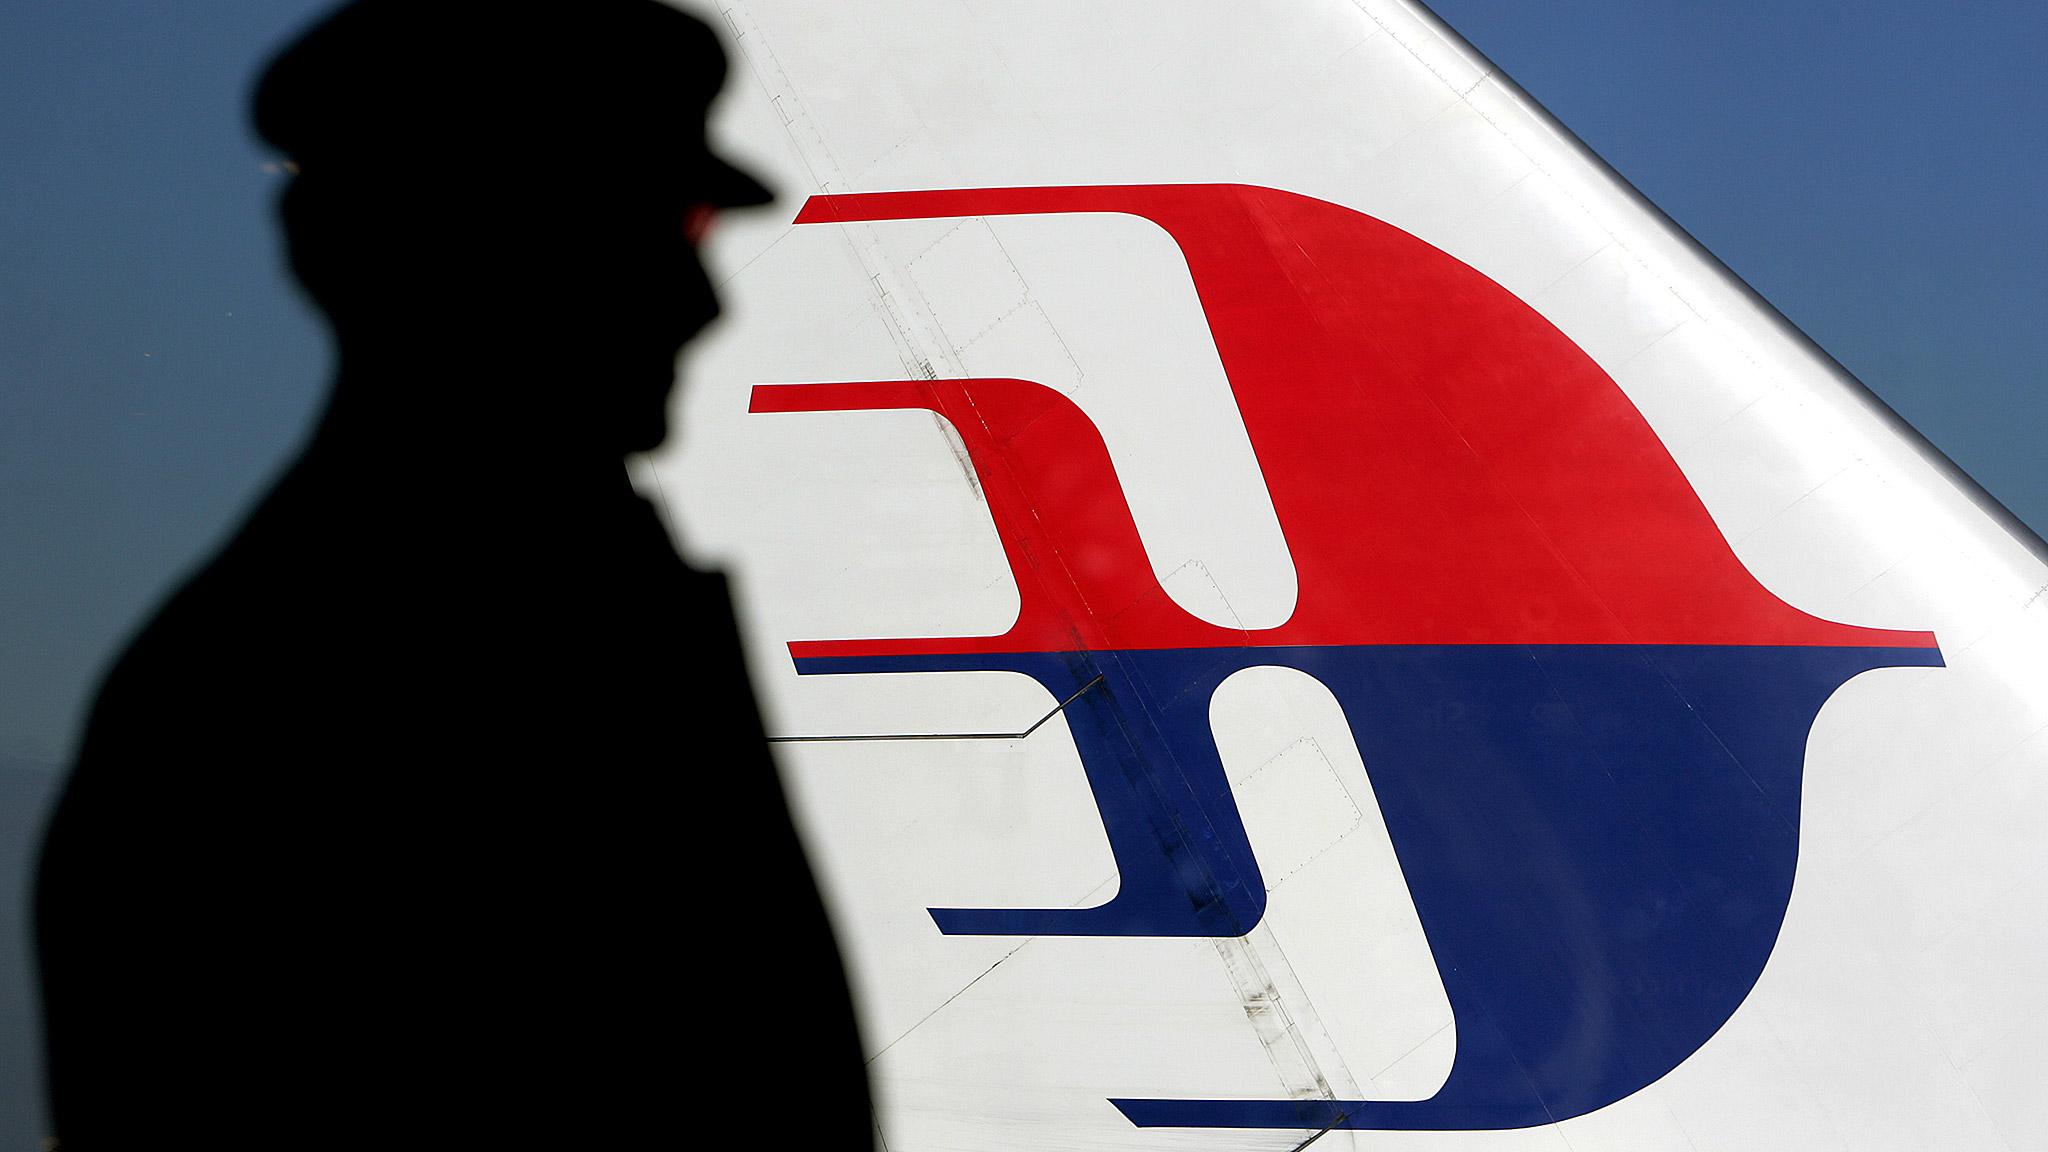 malaysia airlines berhad logo